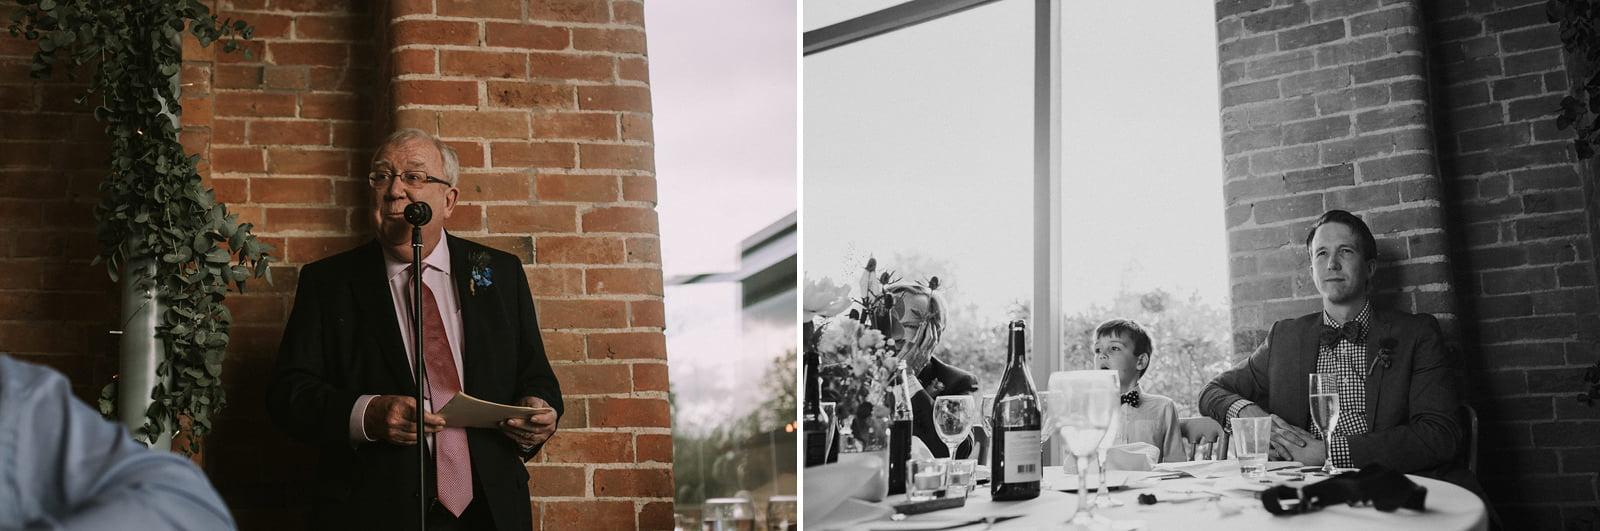 wedding photos swallows nest barn